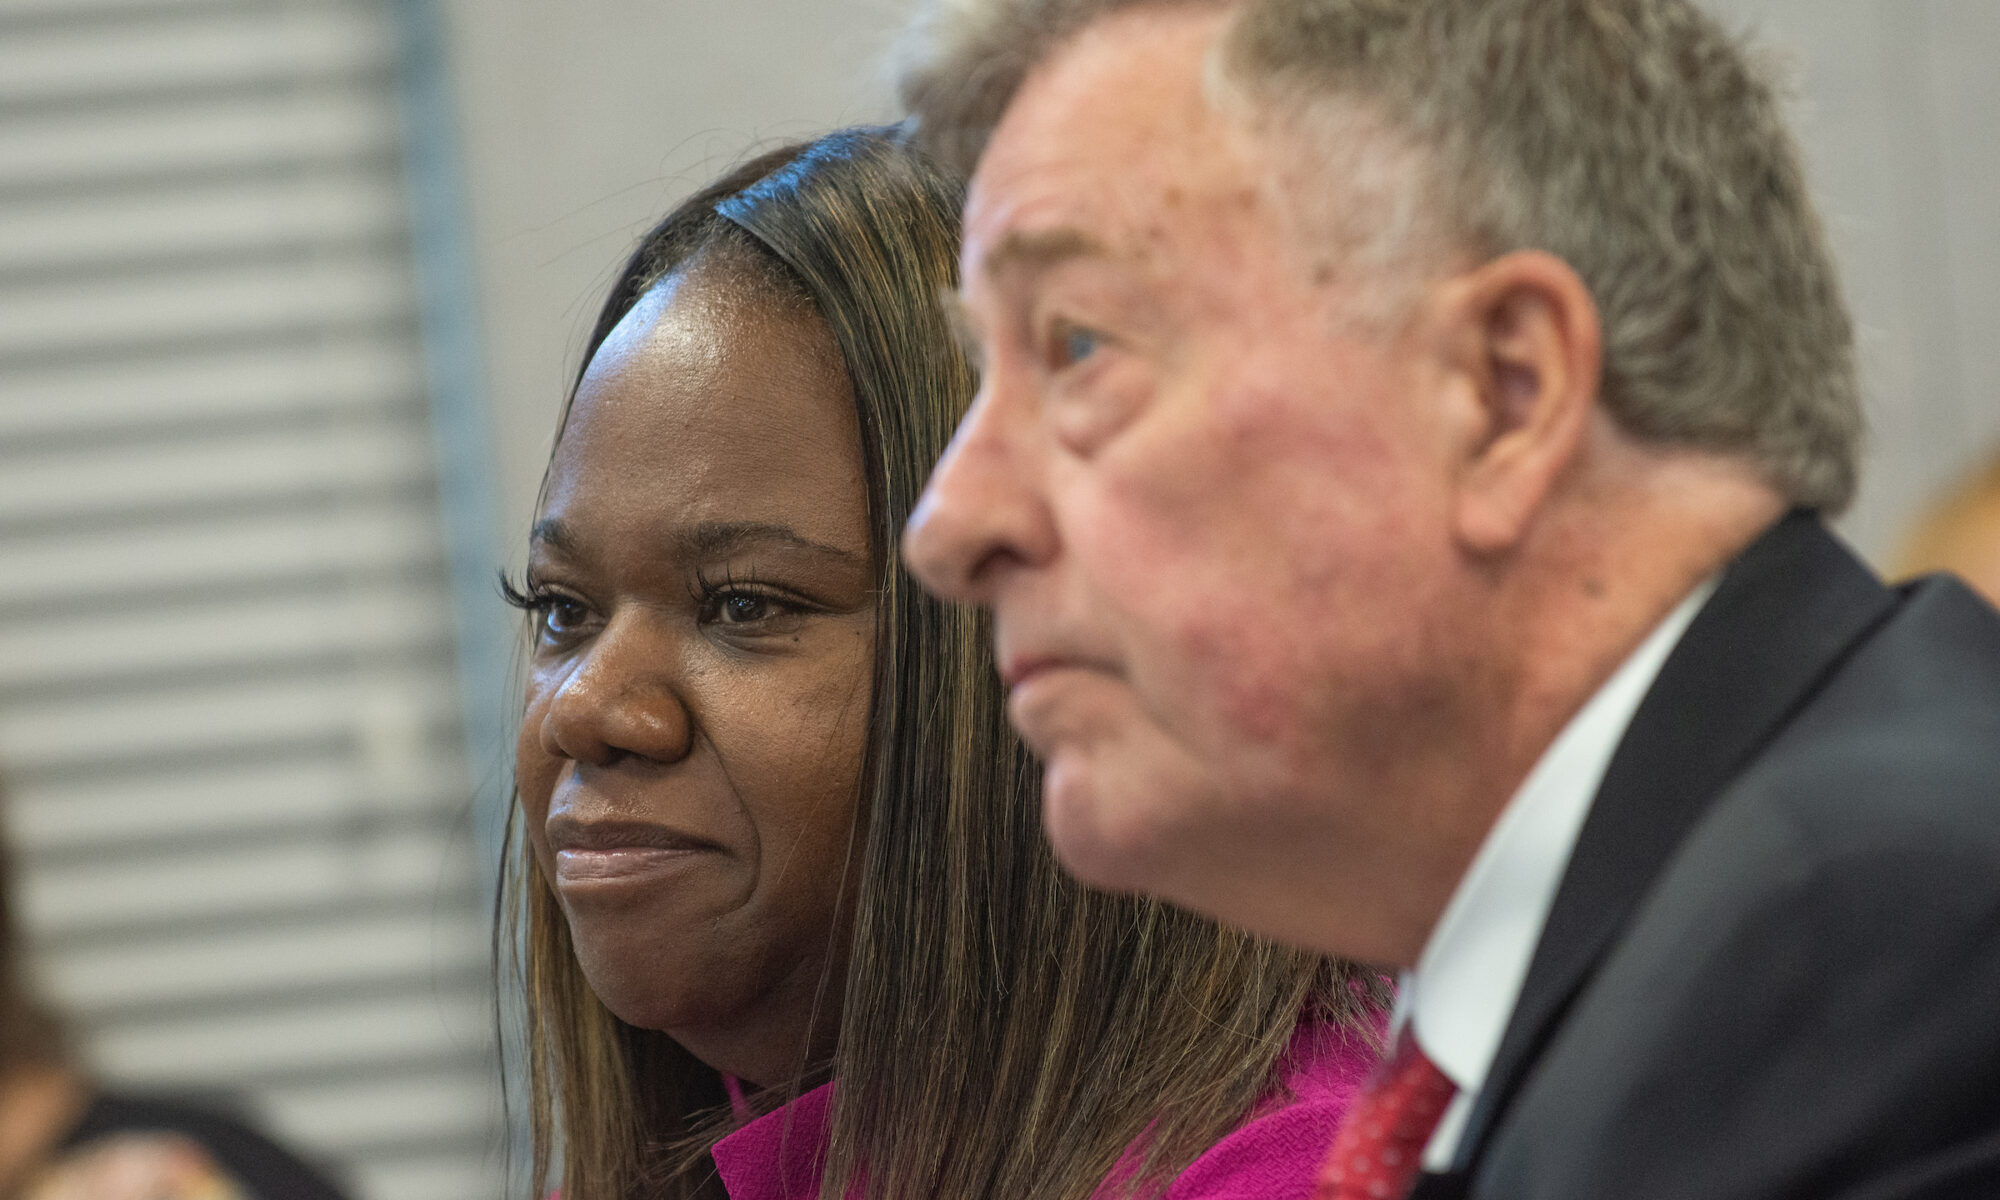 Traci Davis and her attorney William Peterson